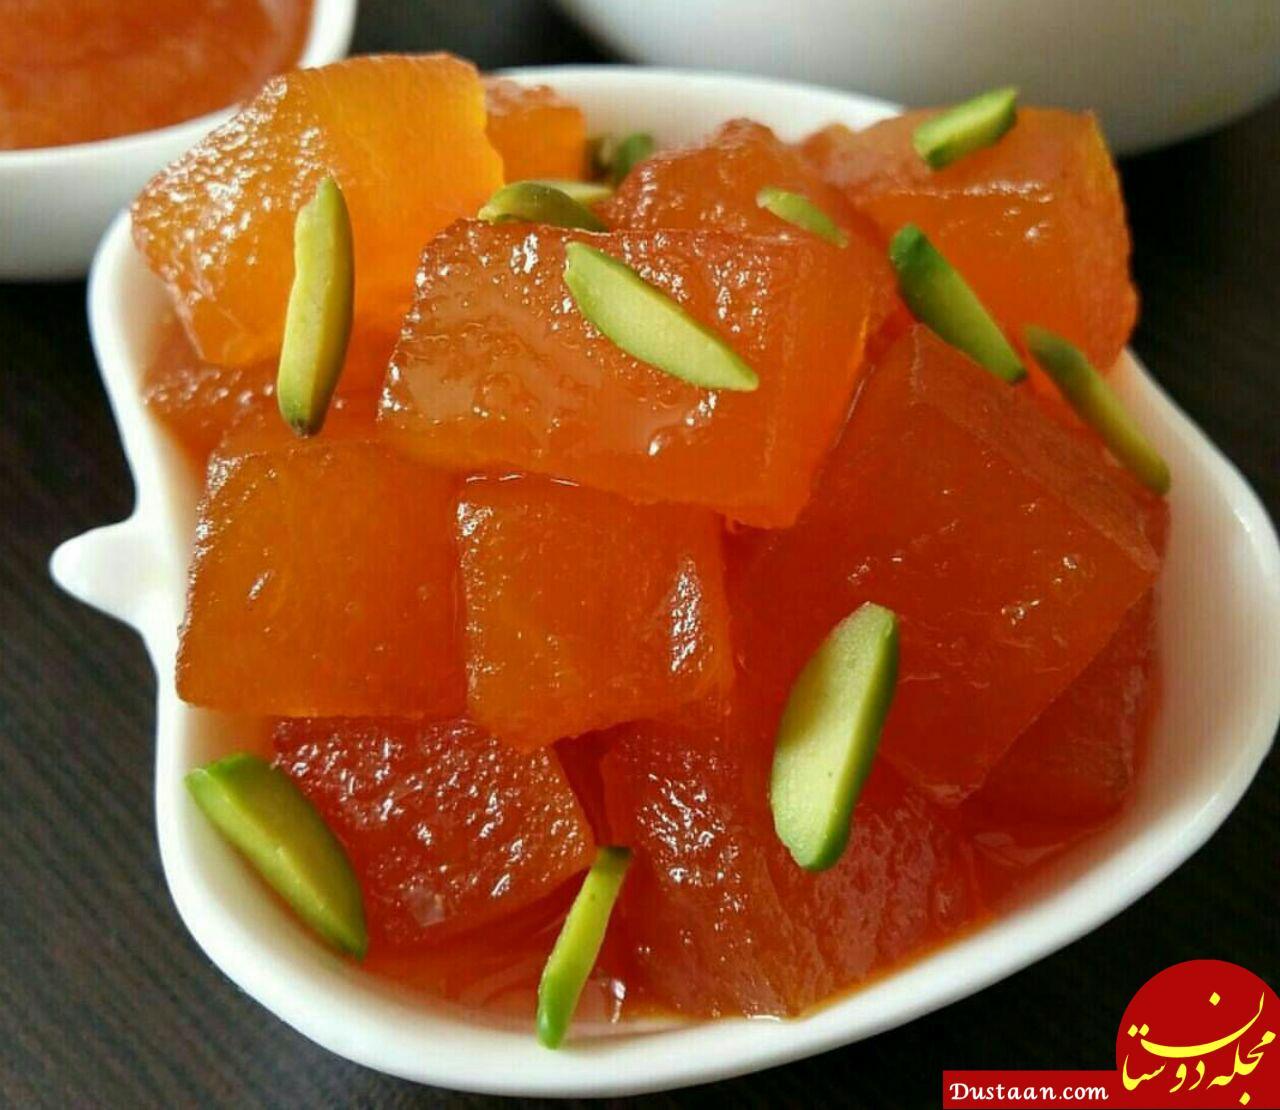 www.dustaan.com طرز تهیه مربا سیب به روشی خوشمزه